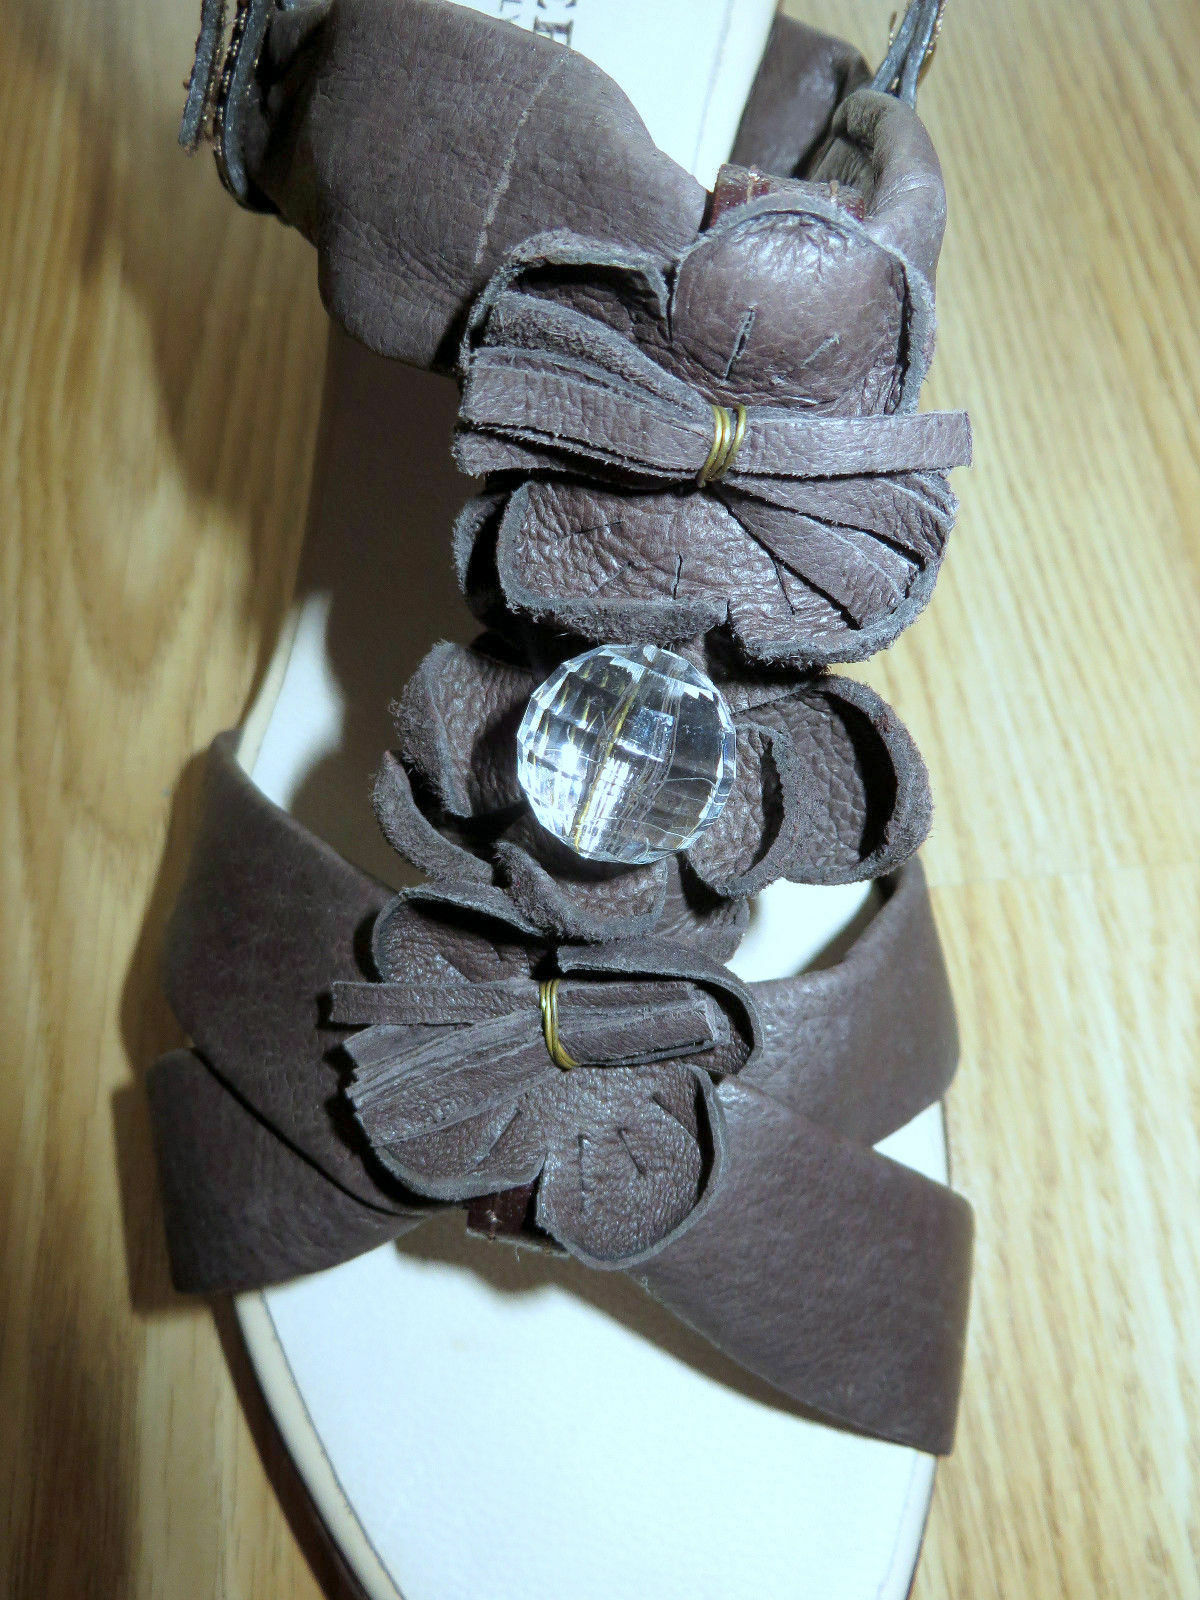 Prativerdi Leder-Sandaleetten in braun, Gr. 41, Made in , NEU